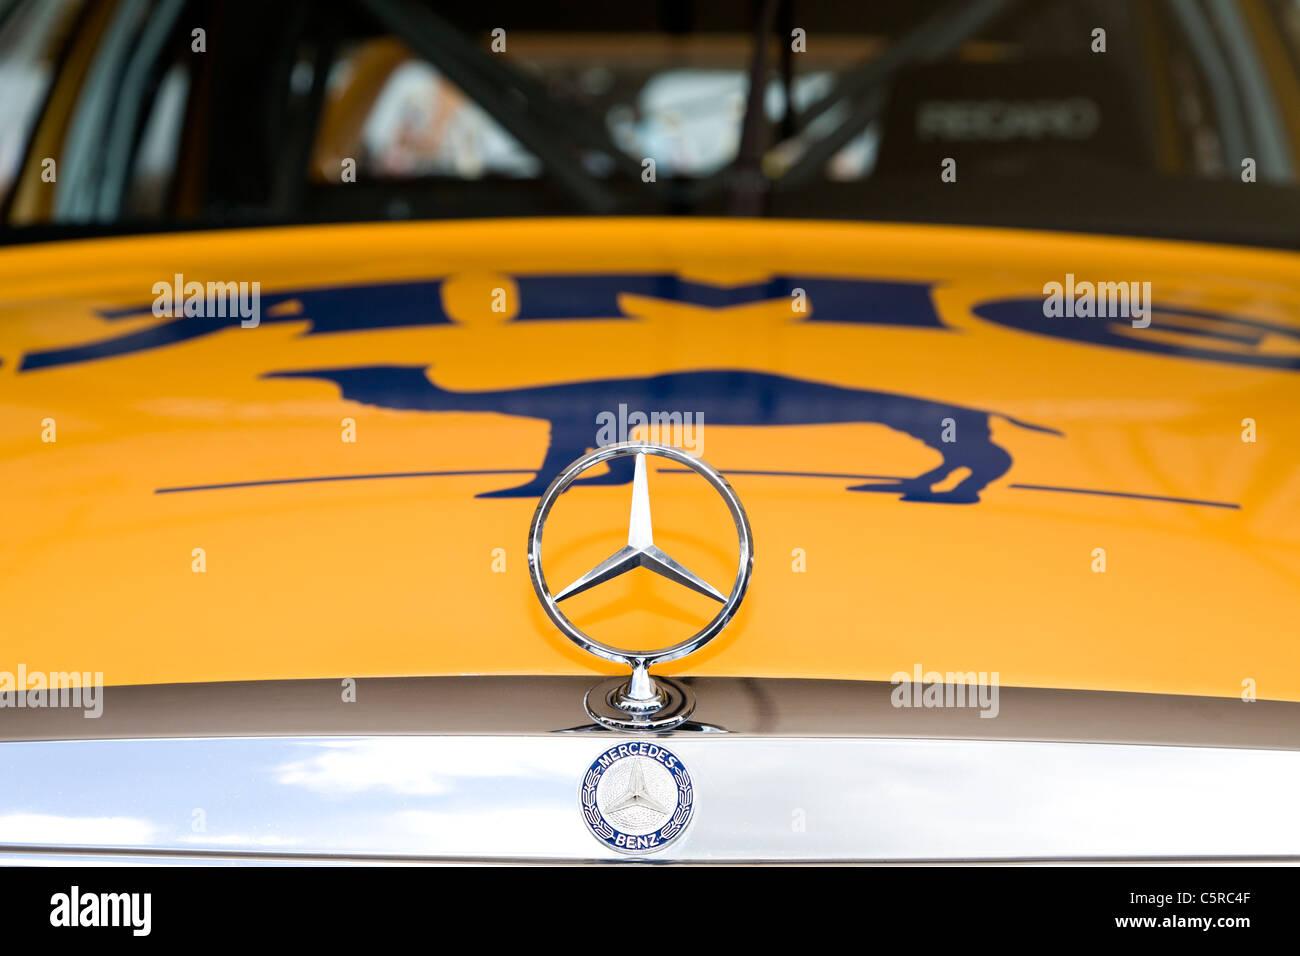 1990 Mercedes-Benz 190 EVO II bonnet badge detail. 2011 Goodwood Festival of Speed, Sussex, England, UK. - Stock Image